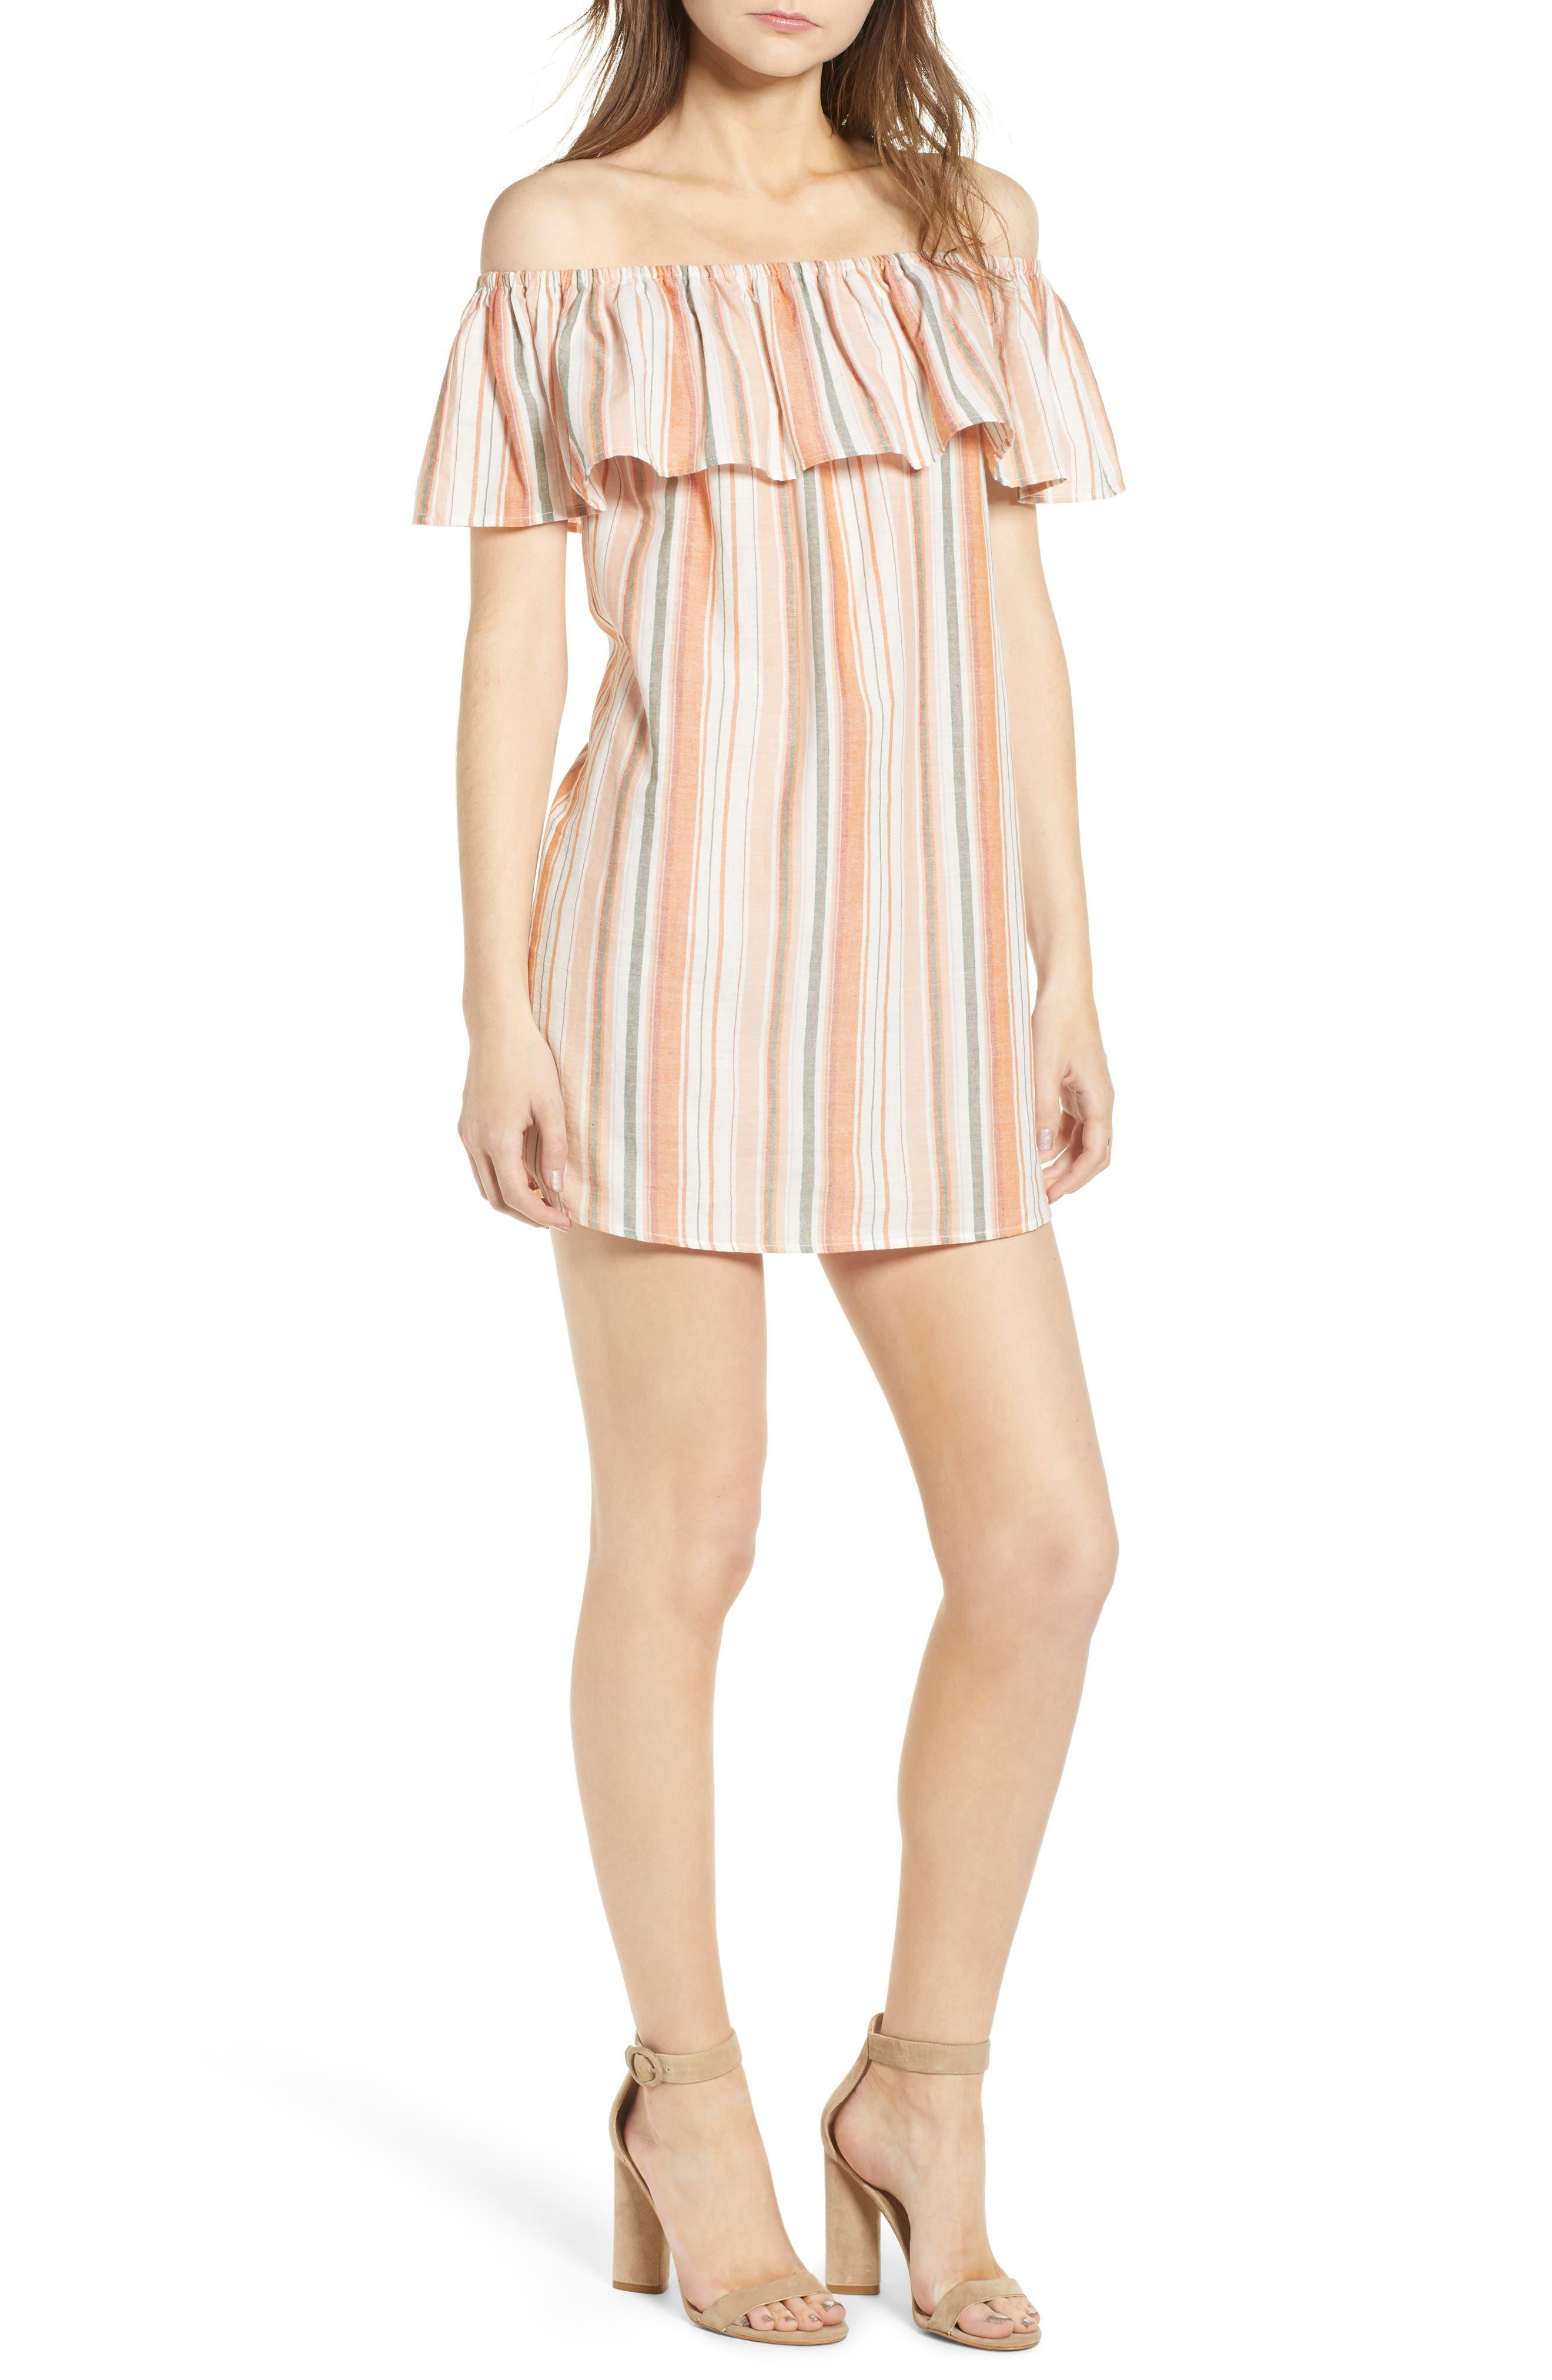 Bishop + Young Sunset Stripe Off the Shoulder Dress,                             Main thumbnail 1, color,                             Orange White Stripe